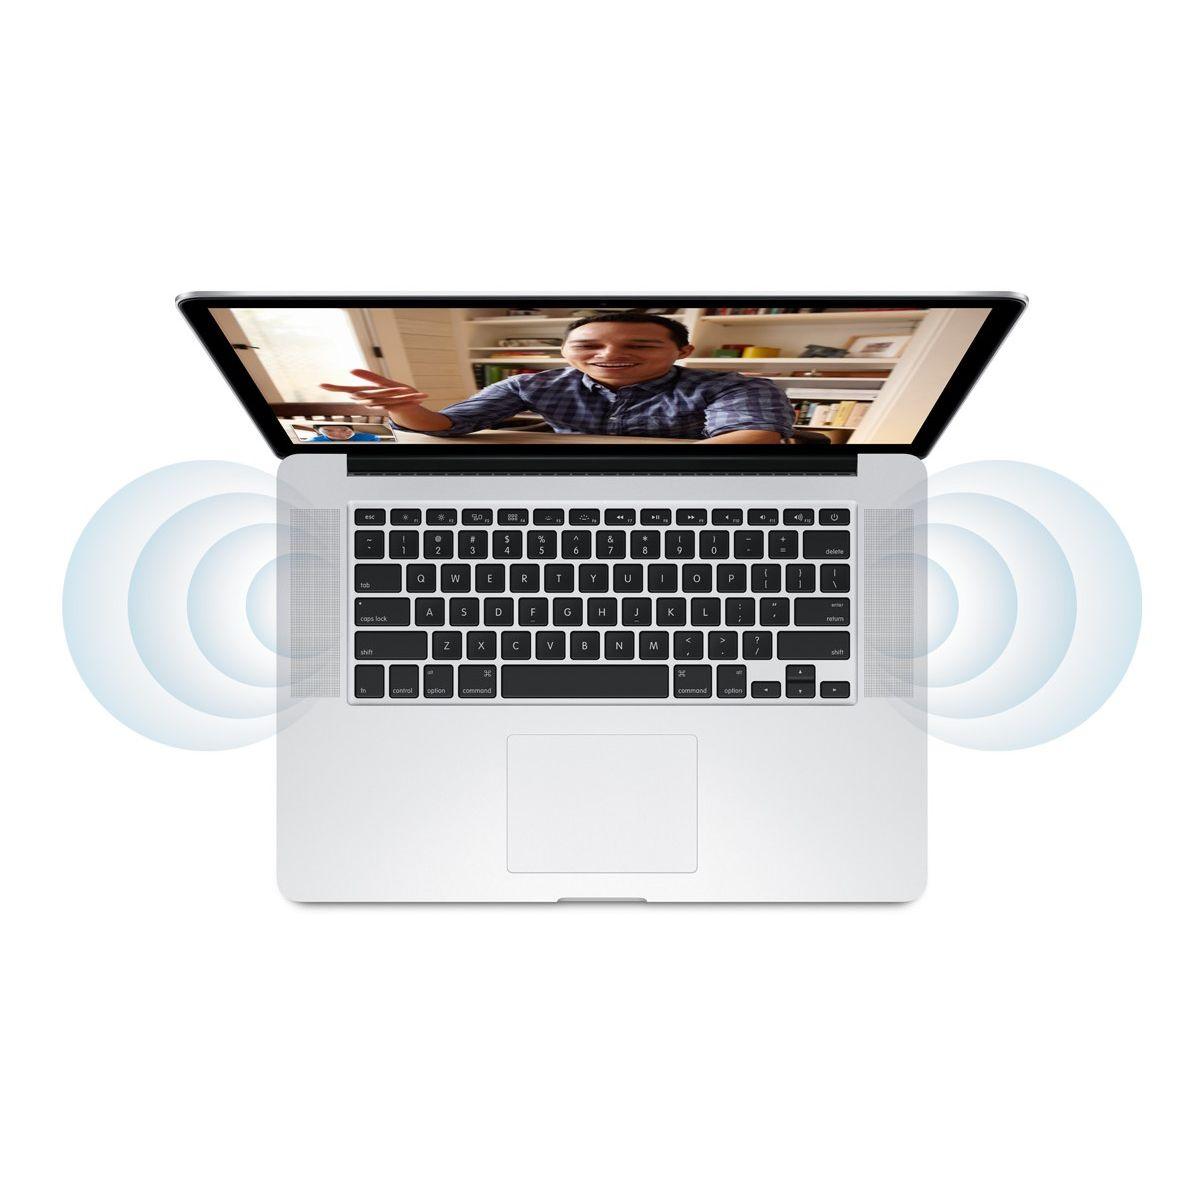 Ordinateur Apple MACBOOK Pro retina 15'' 2.2ghz 16go 256go FT